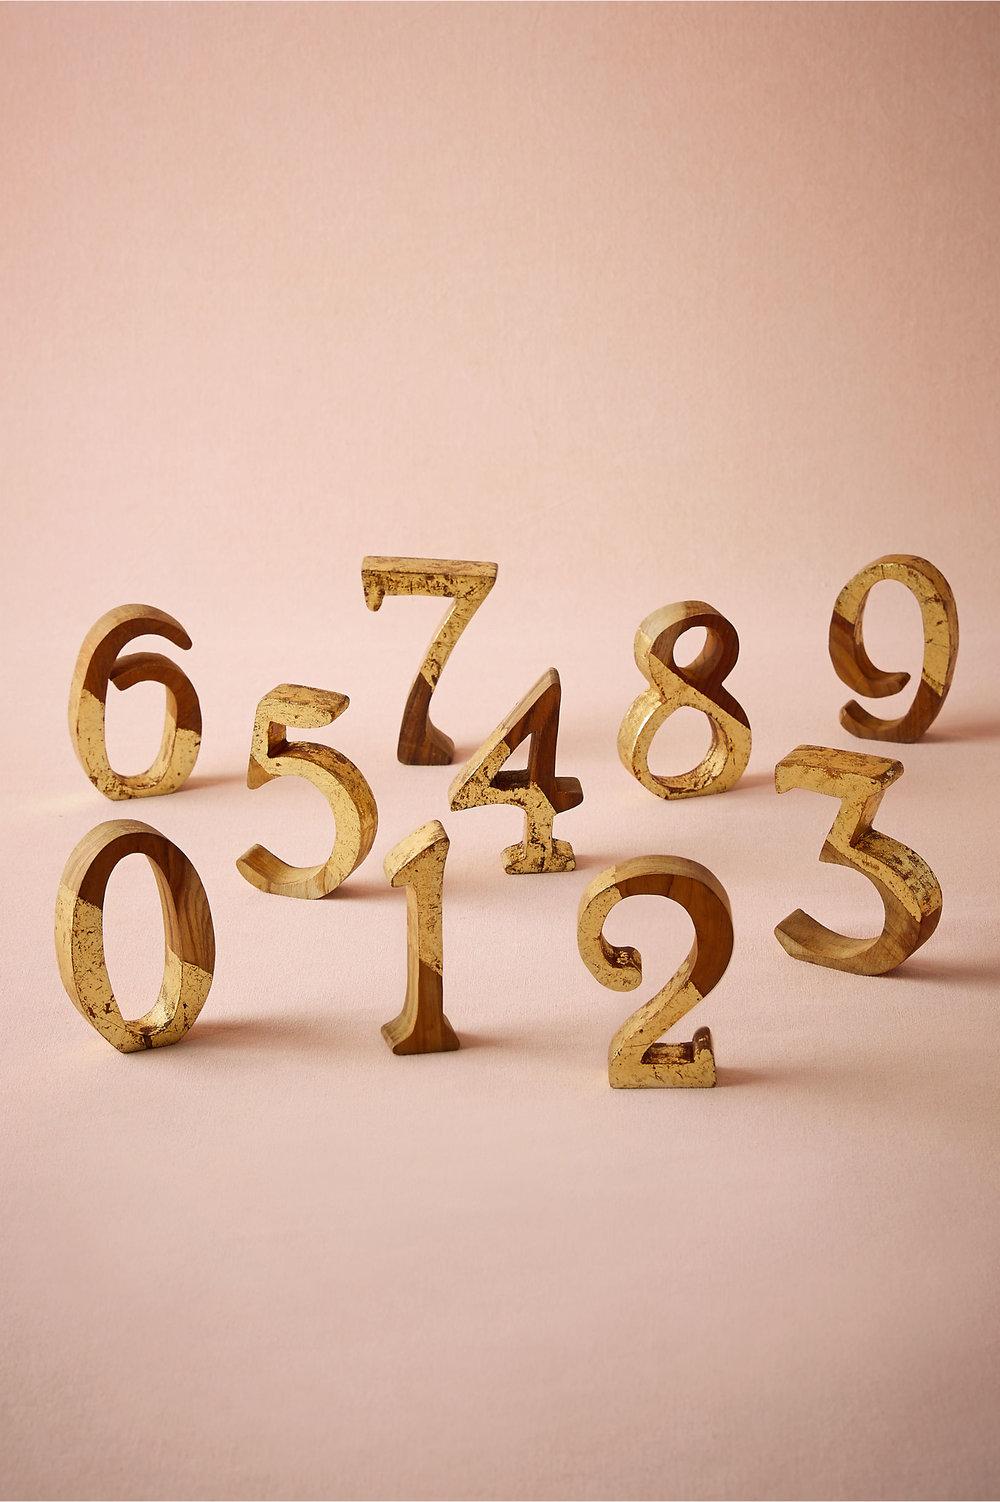 1-15 Teak/Gold Numbers $8